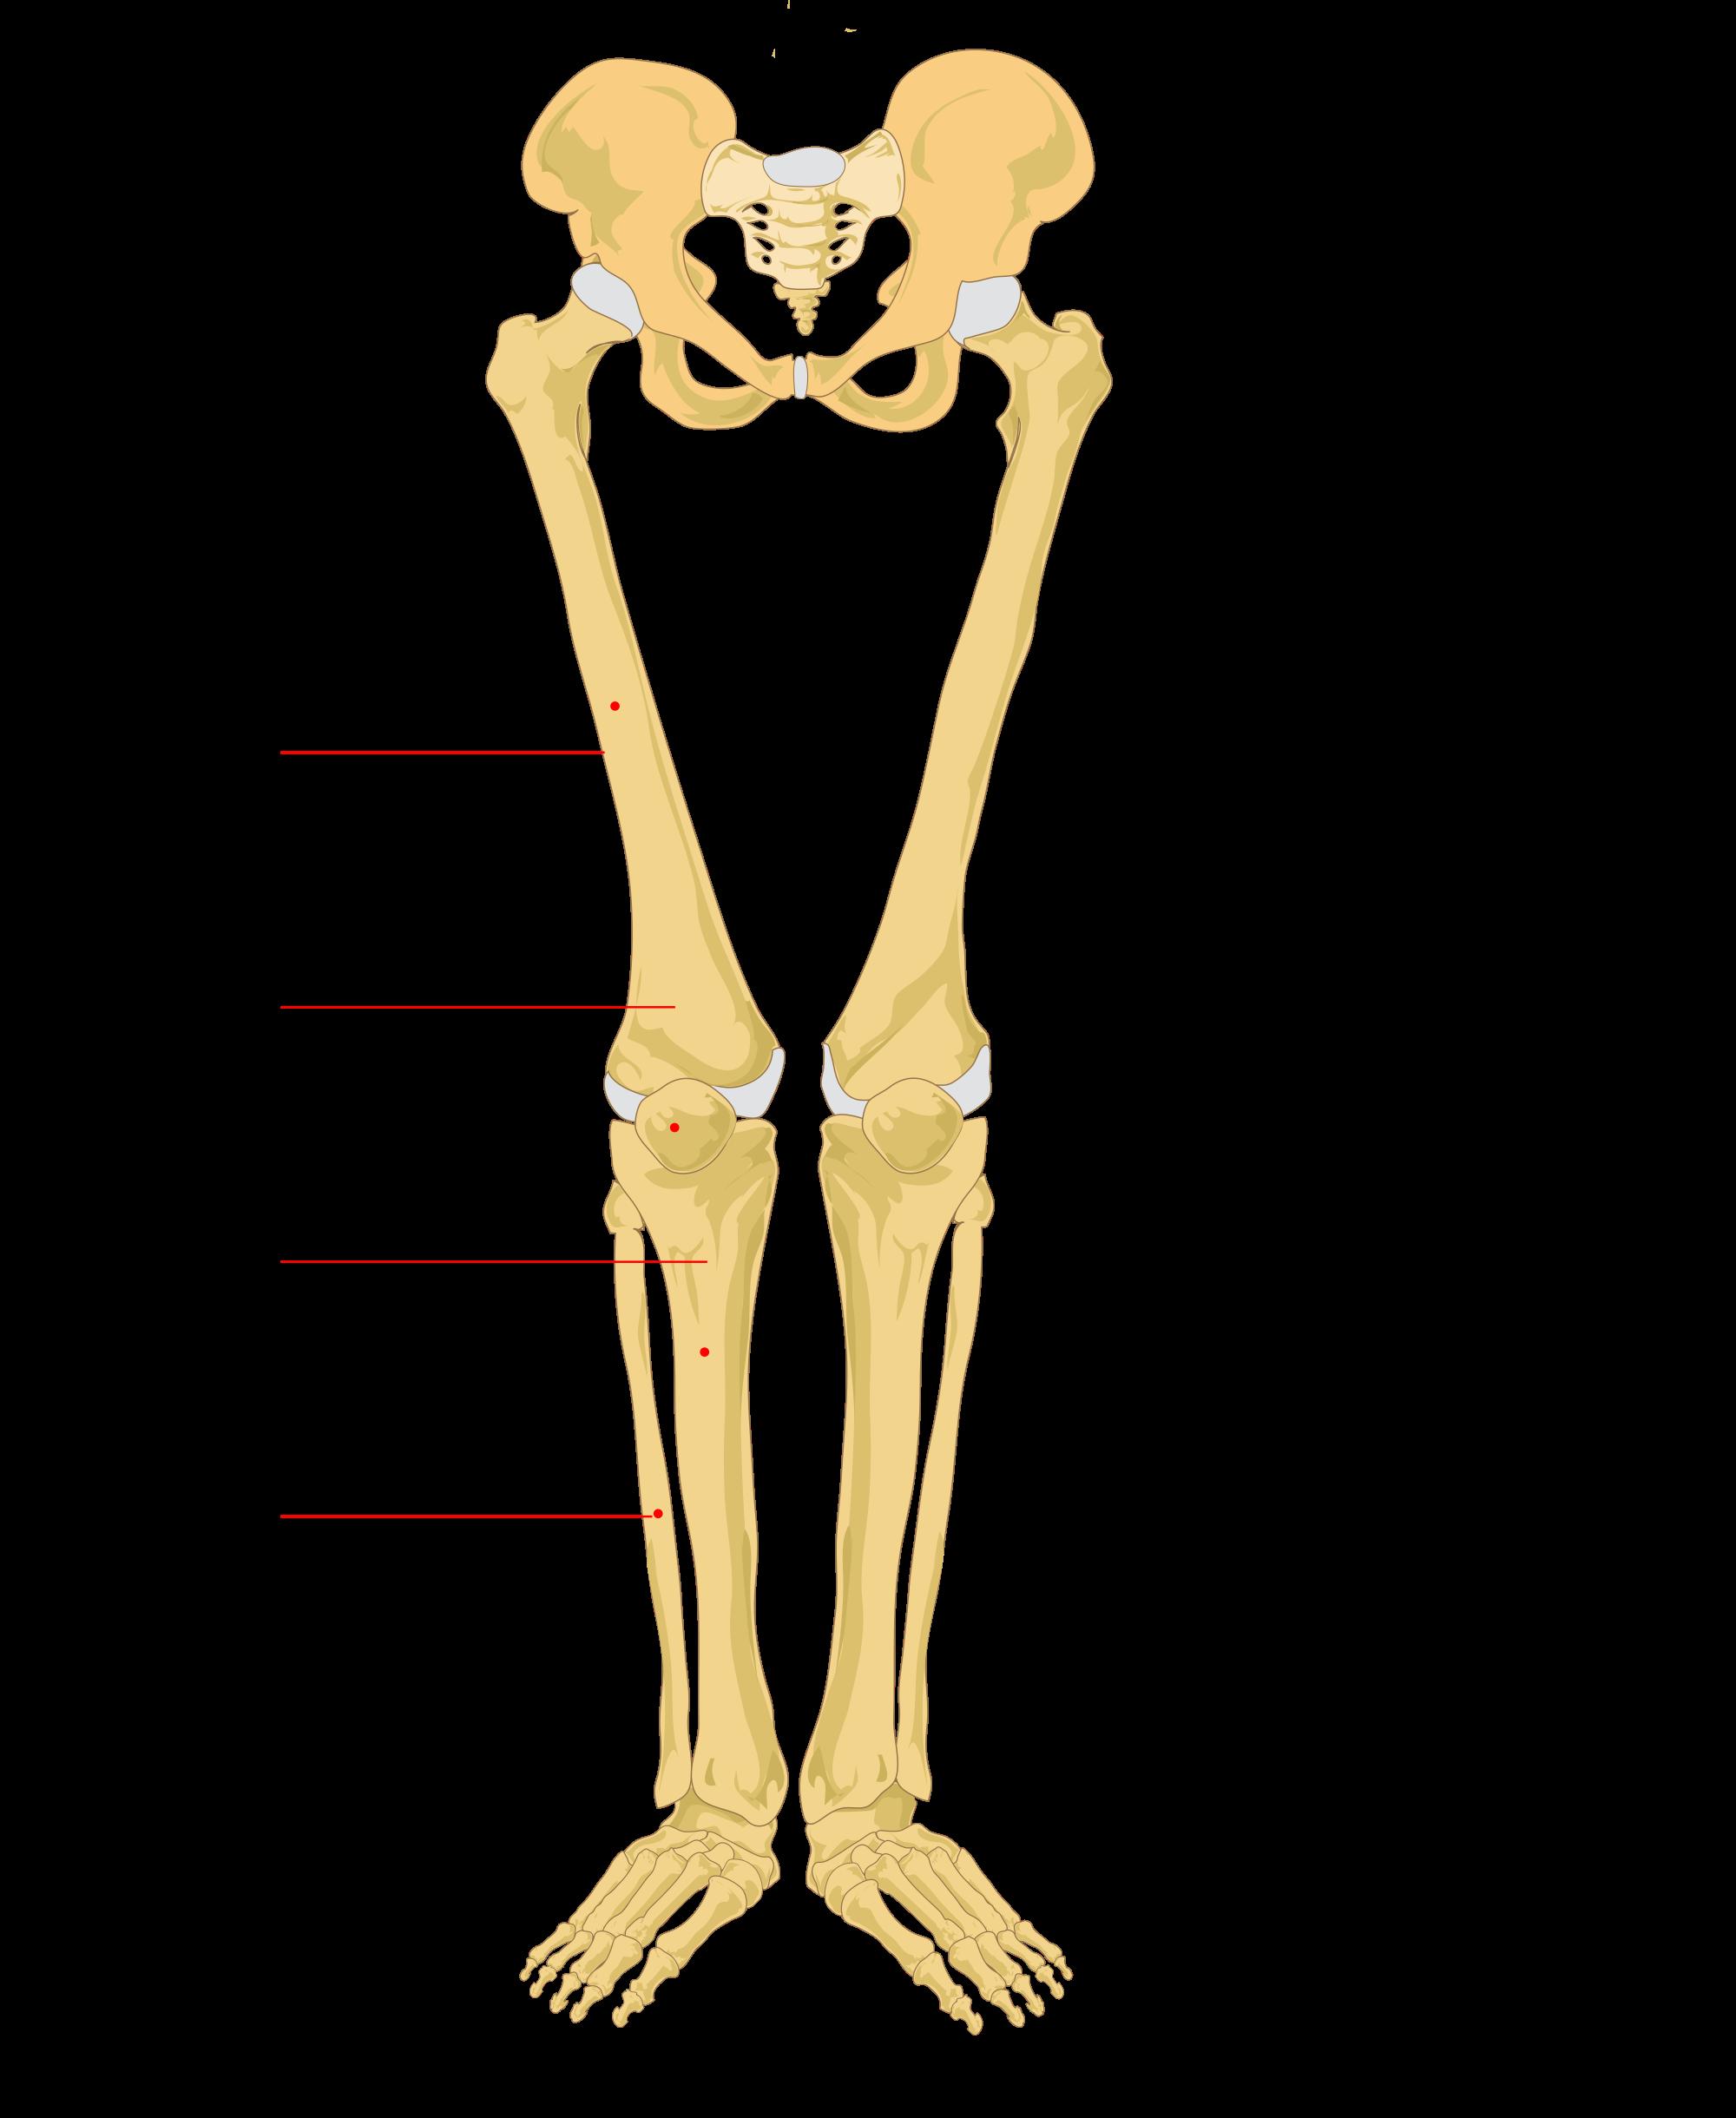 jpg free stock File human leg labeled. Bones vector femur bone